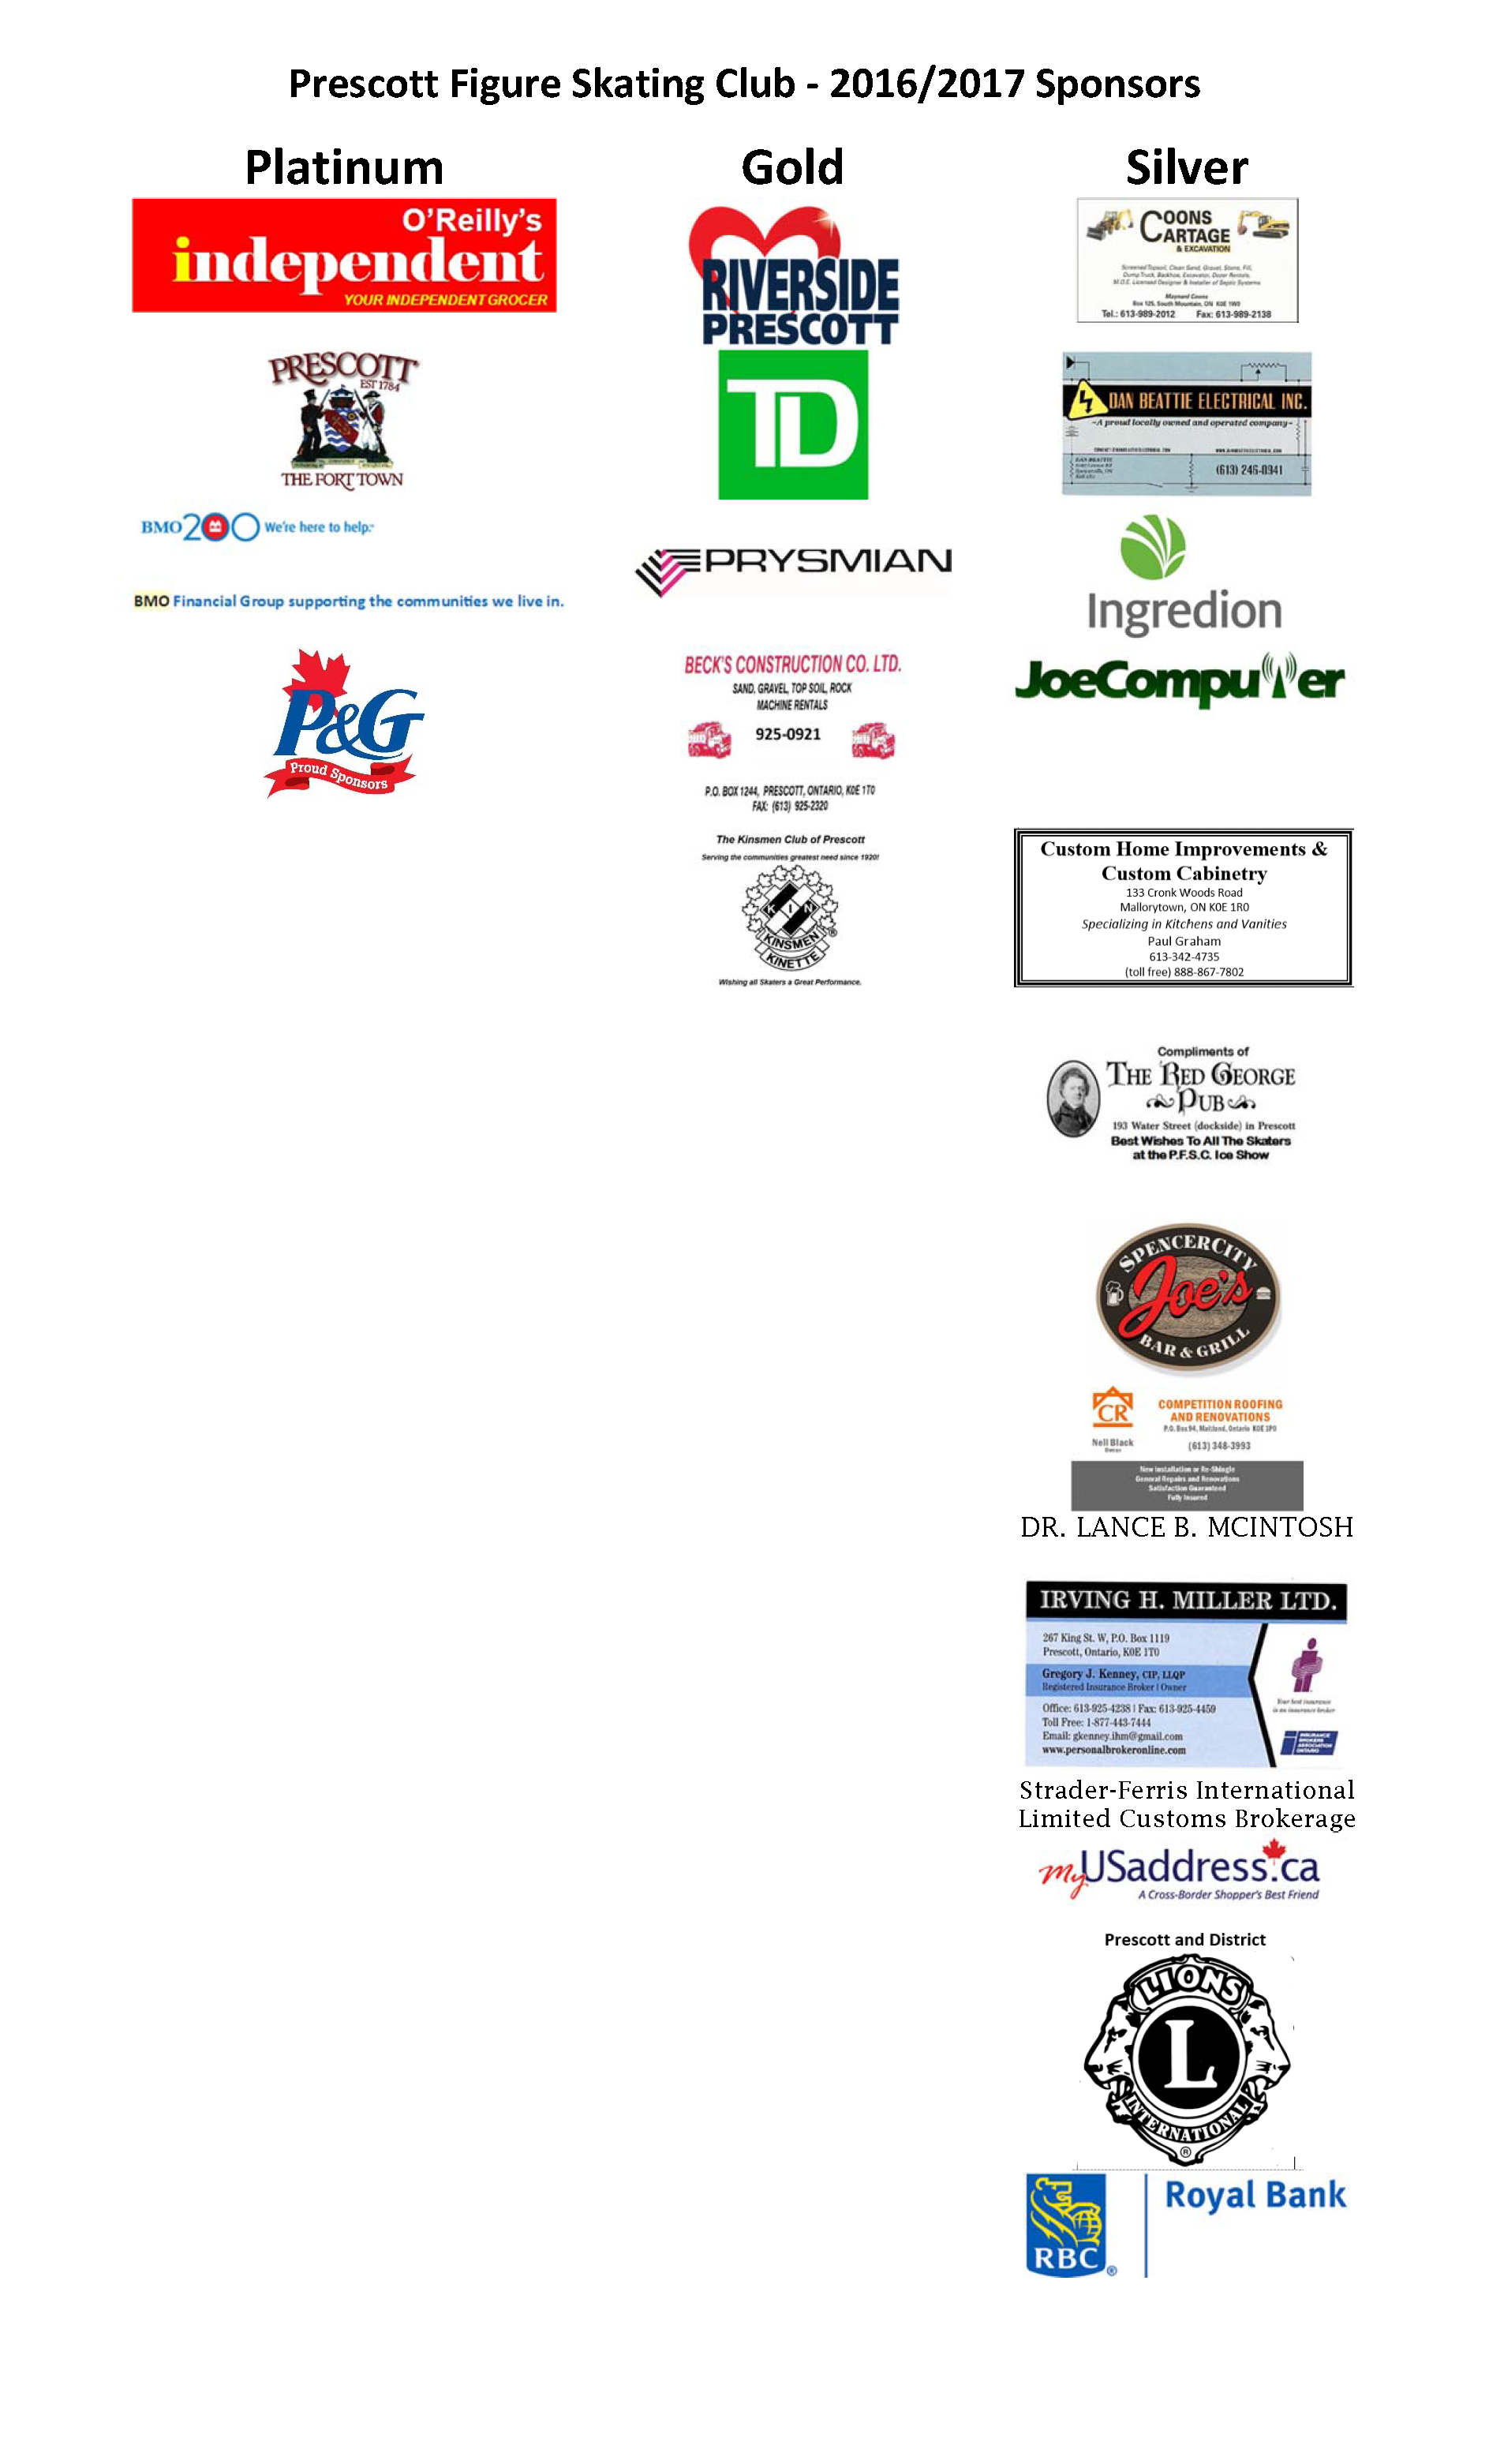 Prescott Figure Skating Club_2016_2017 sponsors